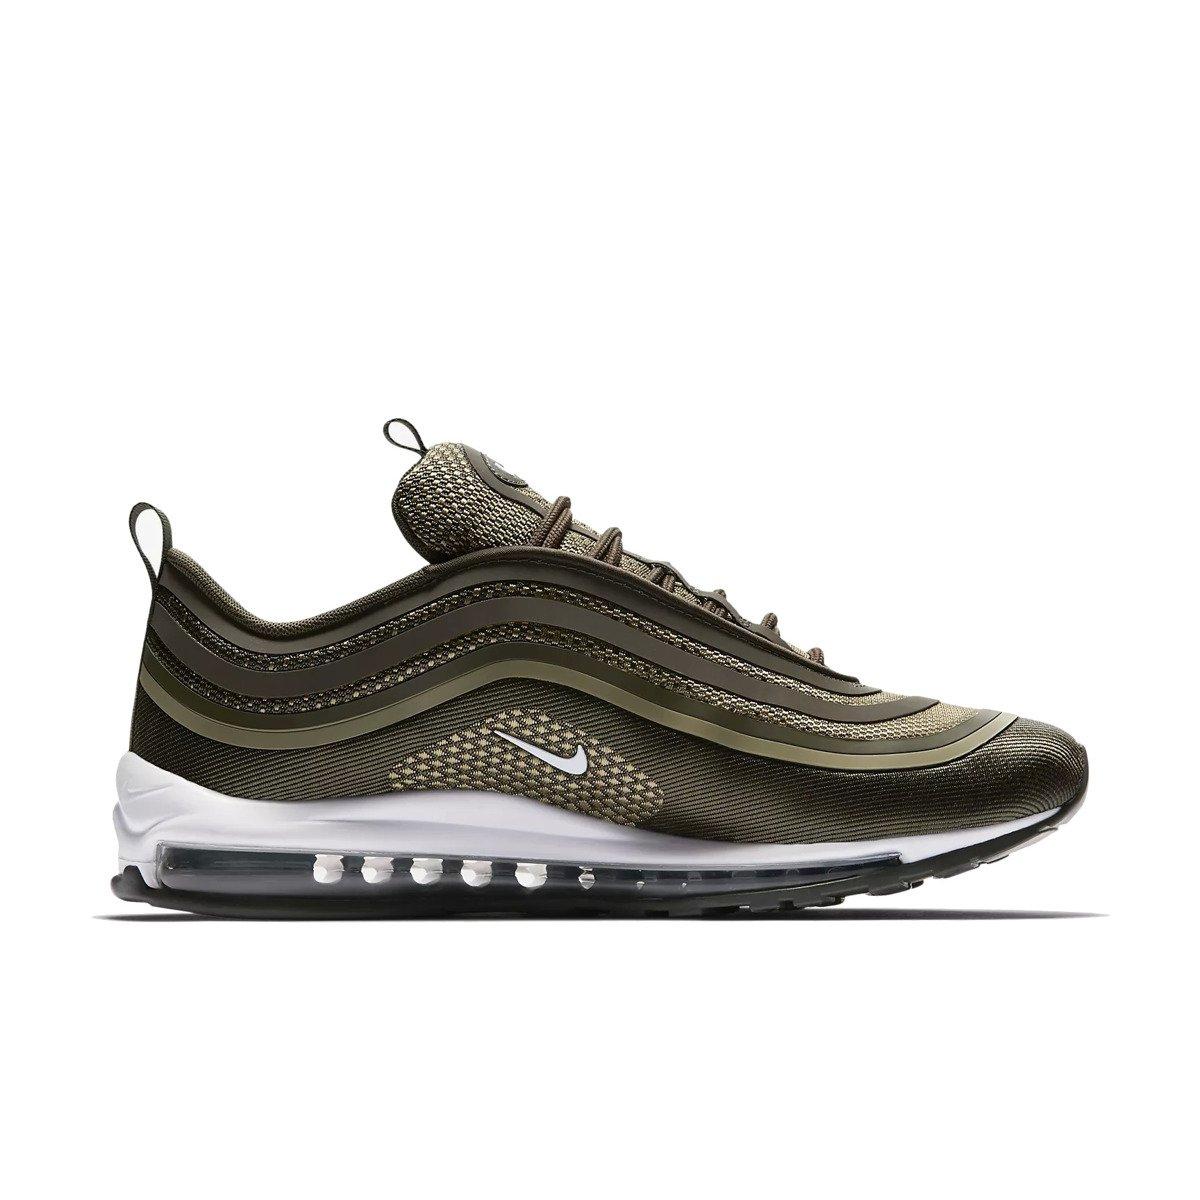 Buty Nike Air Max 97 Ultra '17 918356 301